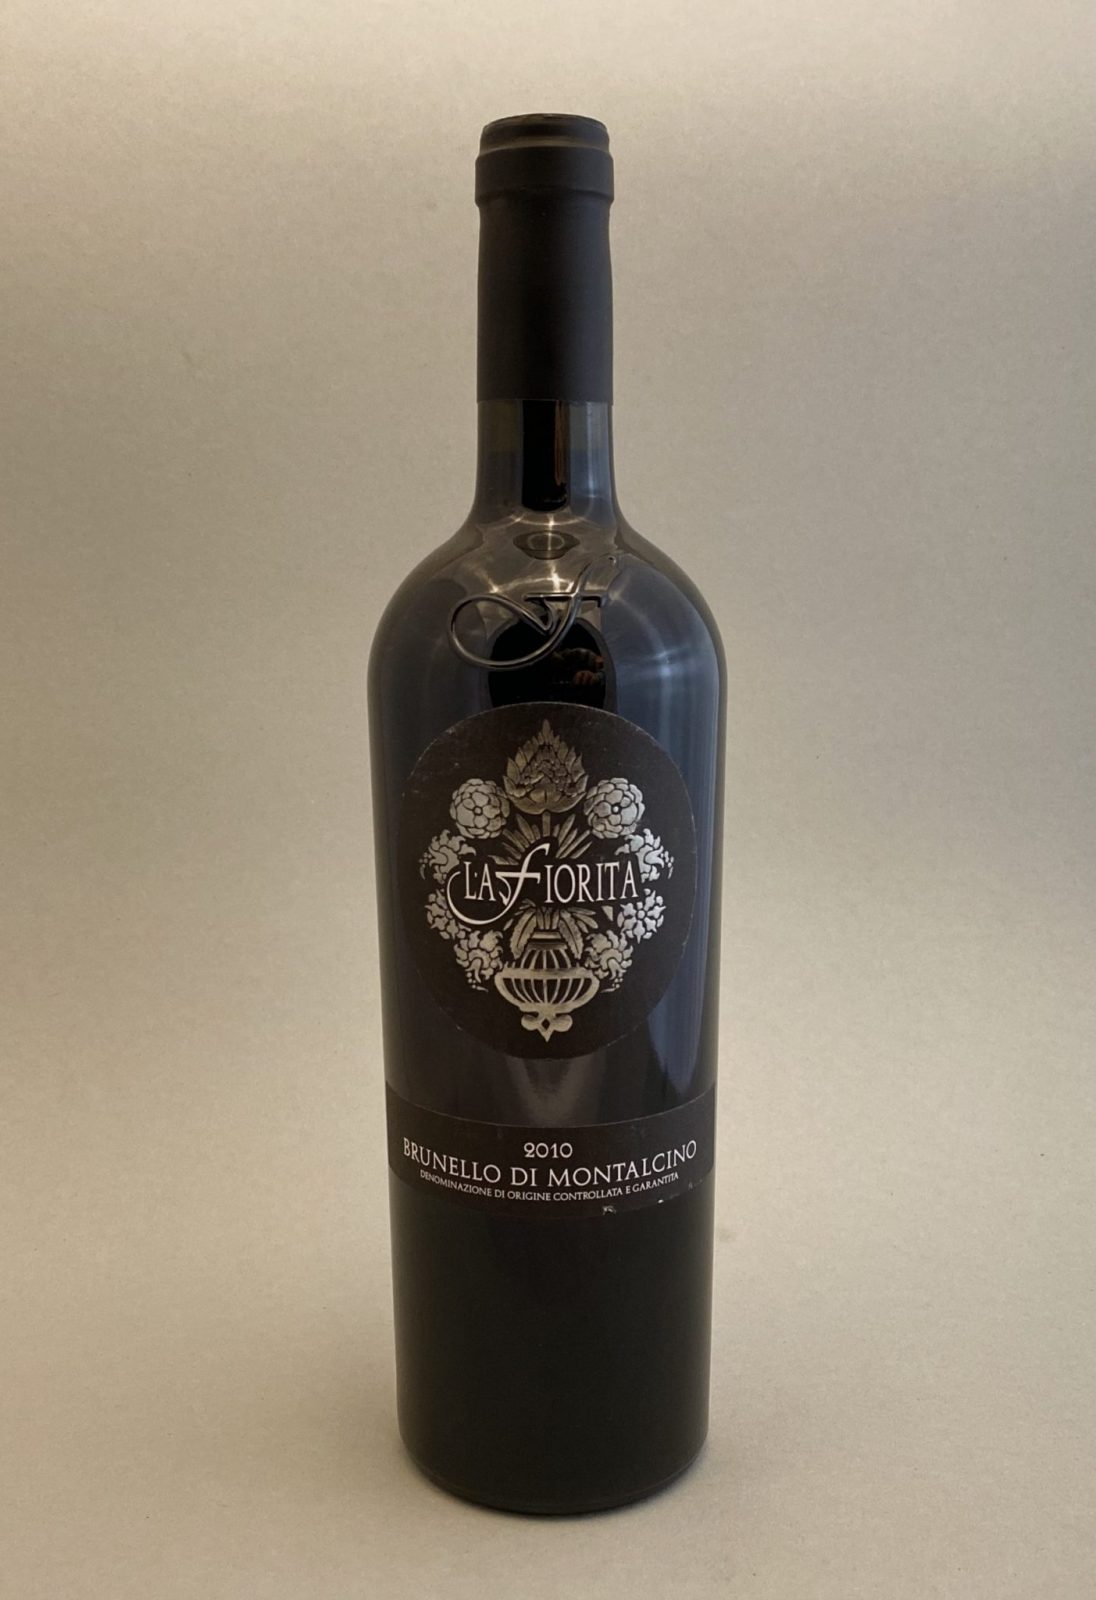 LA FIORITA Brunello Di Montalcino 2010, vinoteka Sunny wines slnecnice mesto, Bratislava petrzalka, vino červené z Talianska, rozvoz vín, eshop